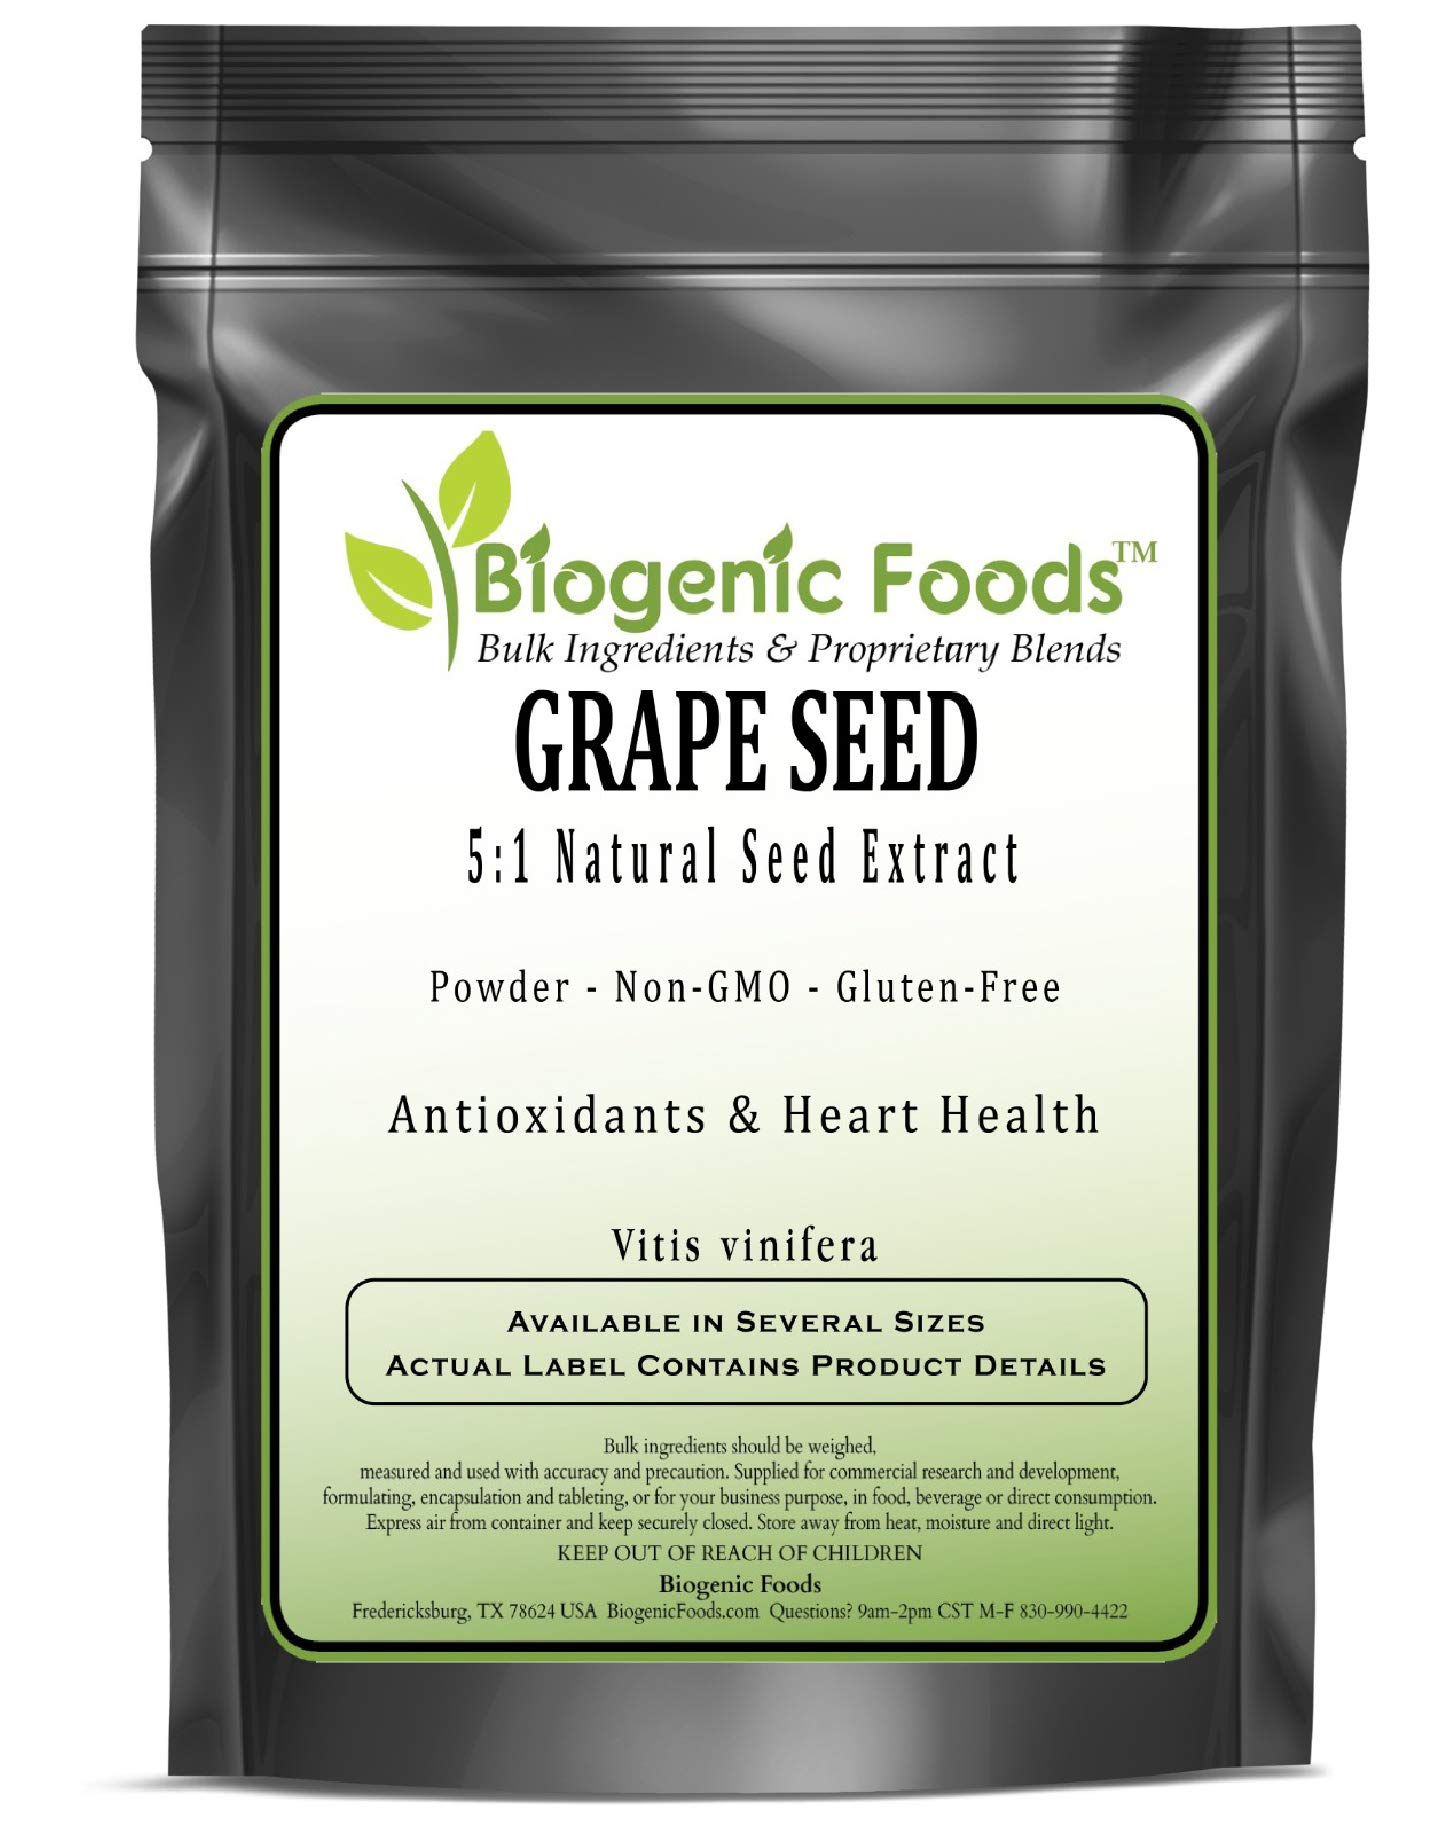 Grape Seed - 5:1 Natural Seed Powder Extract (VIT is vinifera), 10 kg